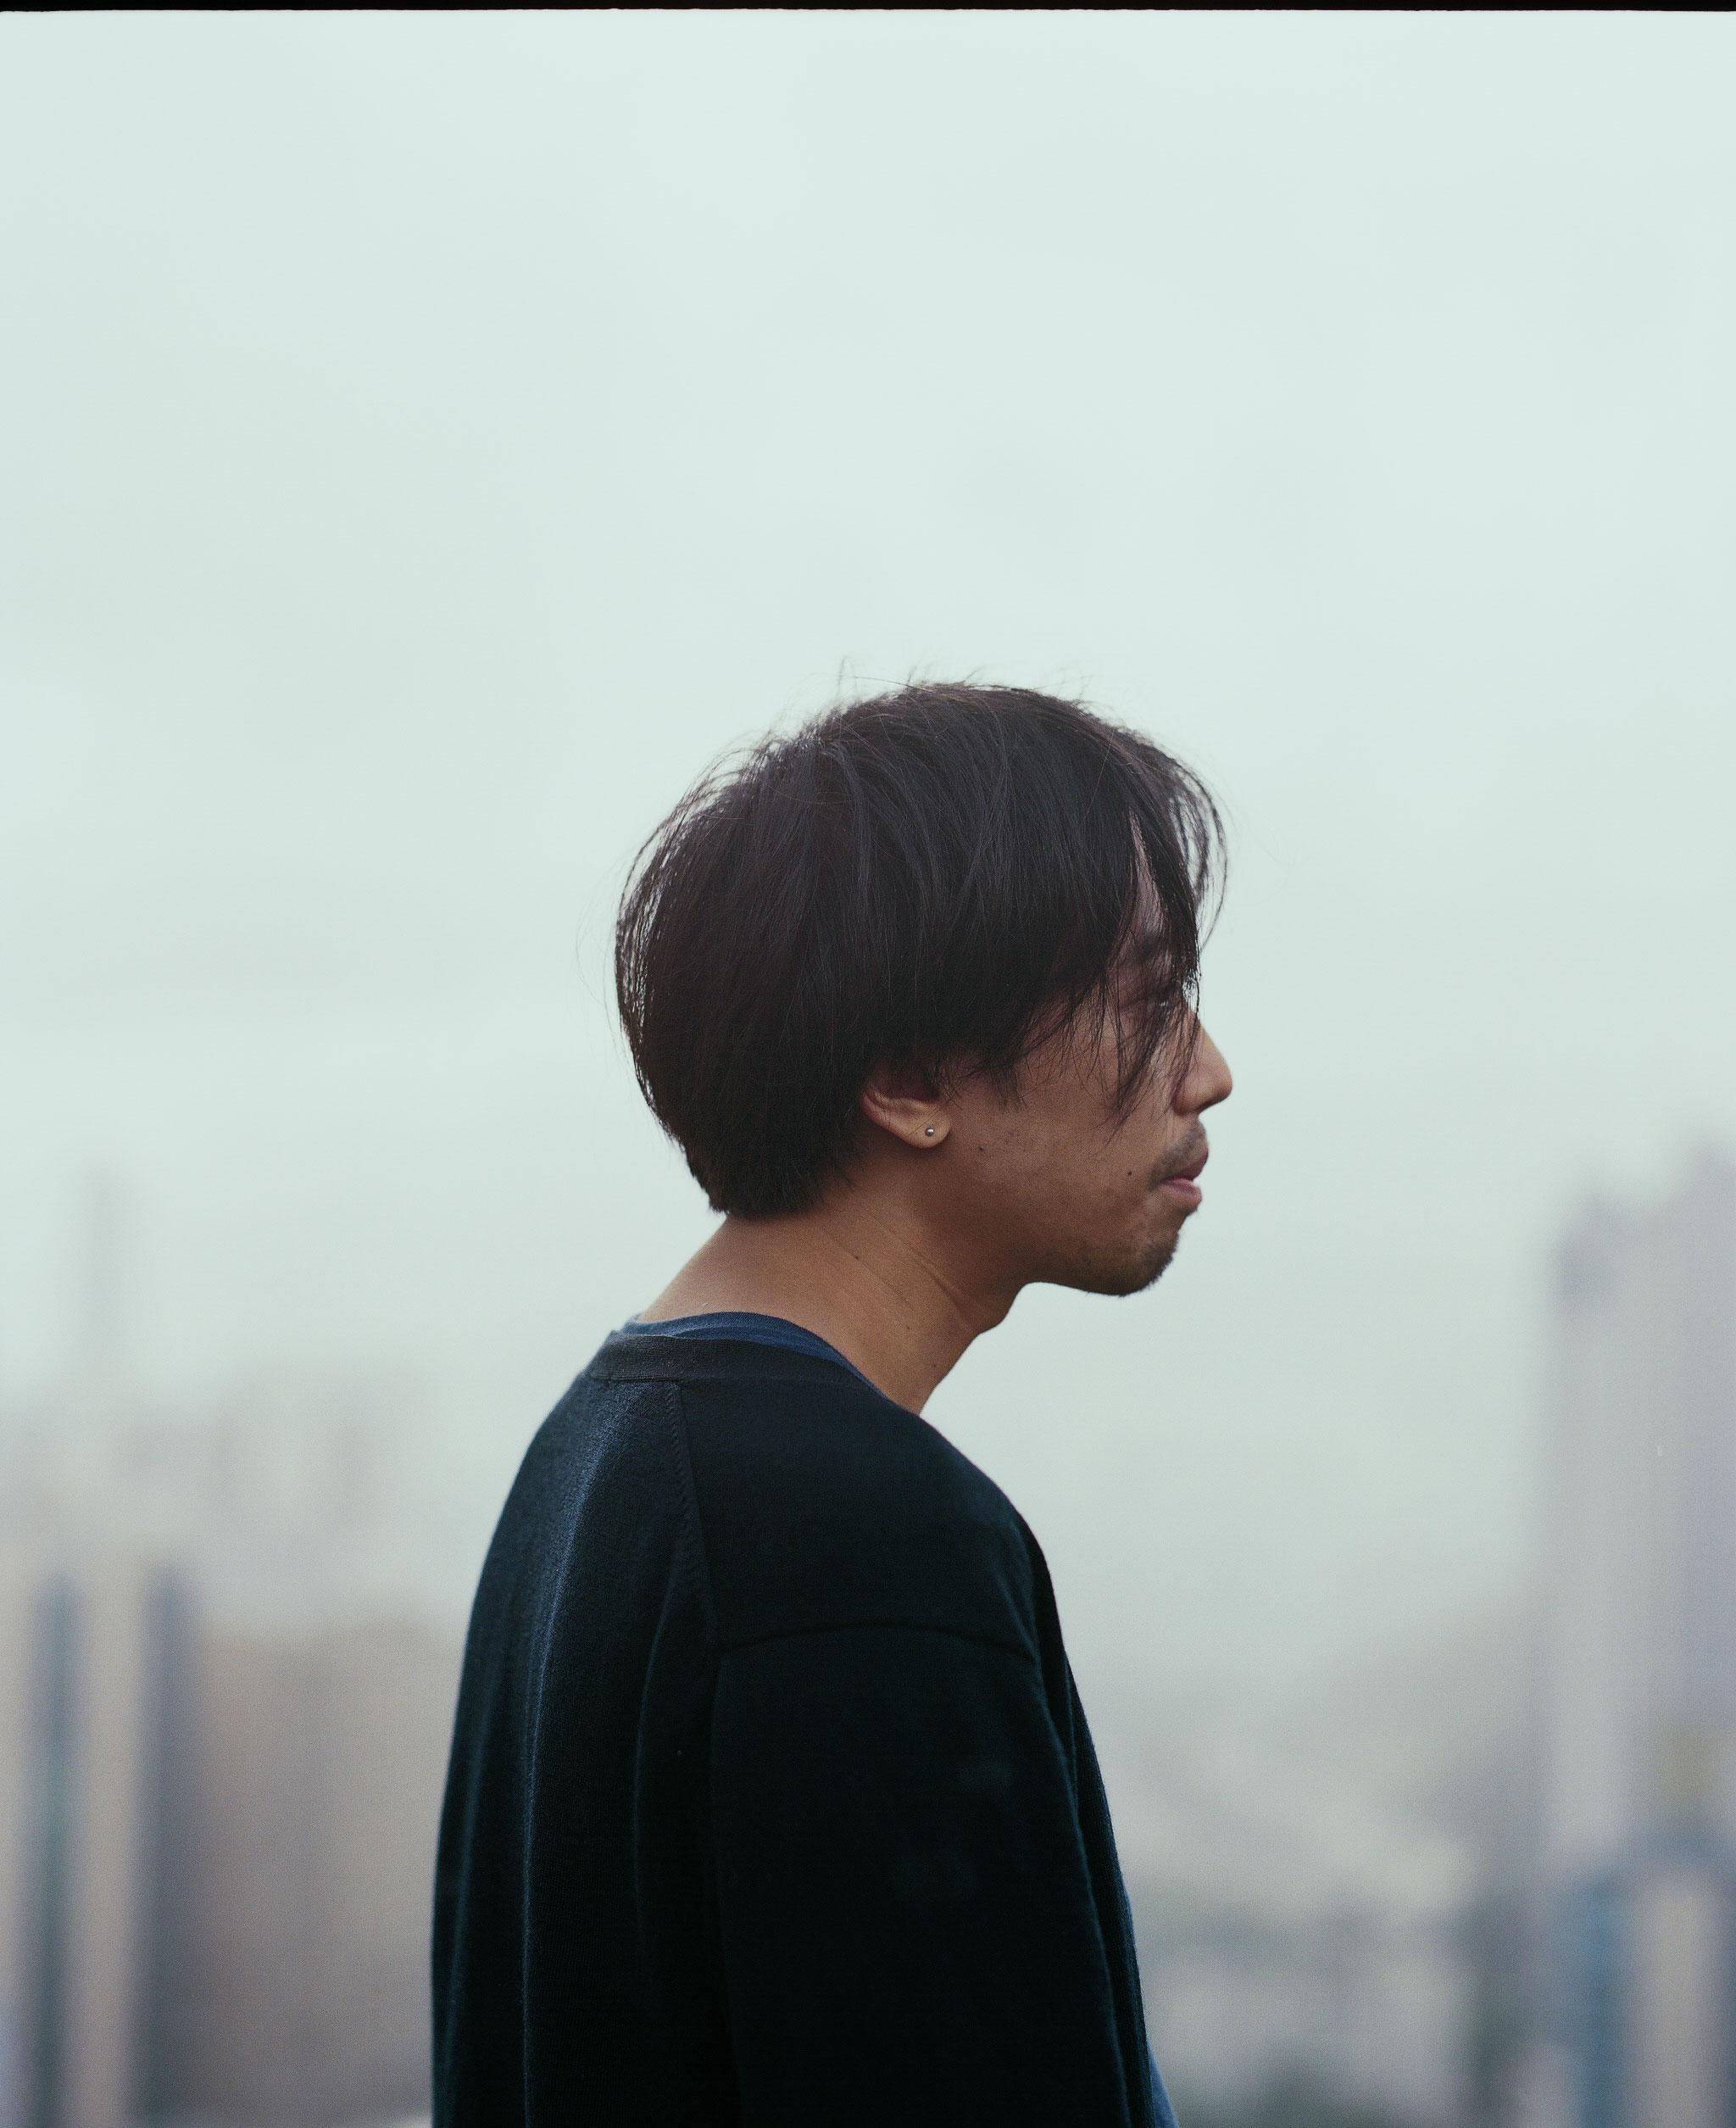 LeungWingLai_Still_Loud-Zine_Michael-CW-Chiu5.jpg